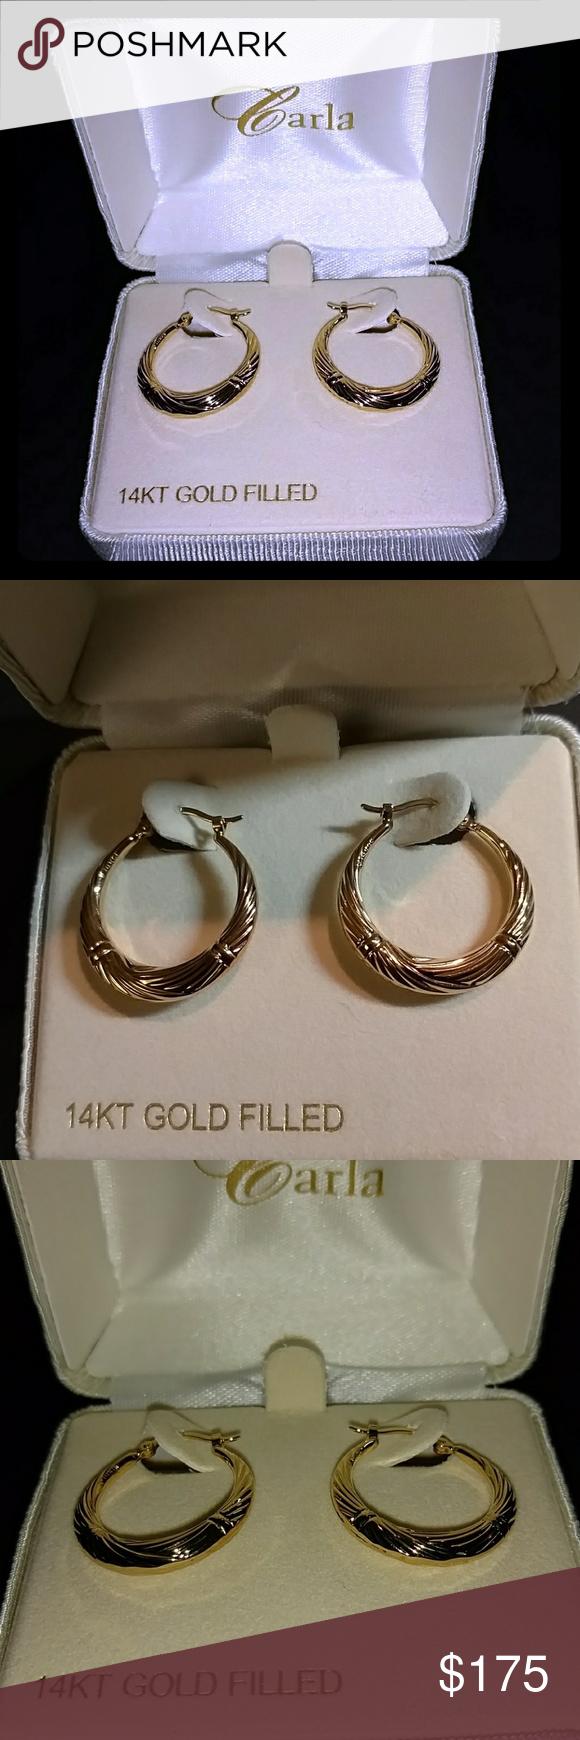 Body piercing earrings  Carla gold hoop earrings  Gold hoops Smoke free and Piercing